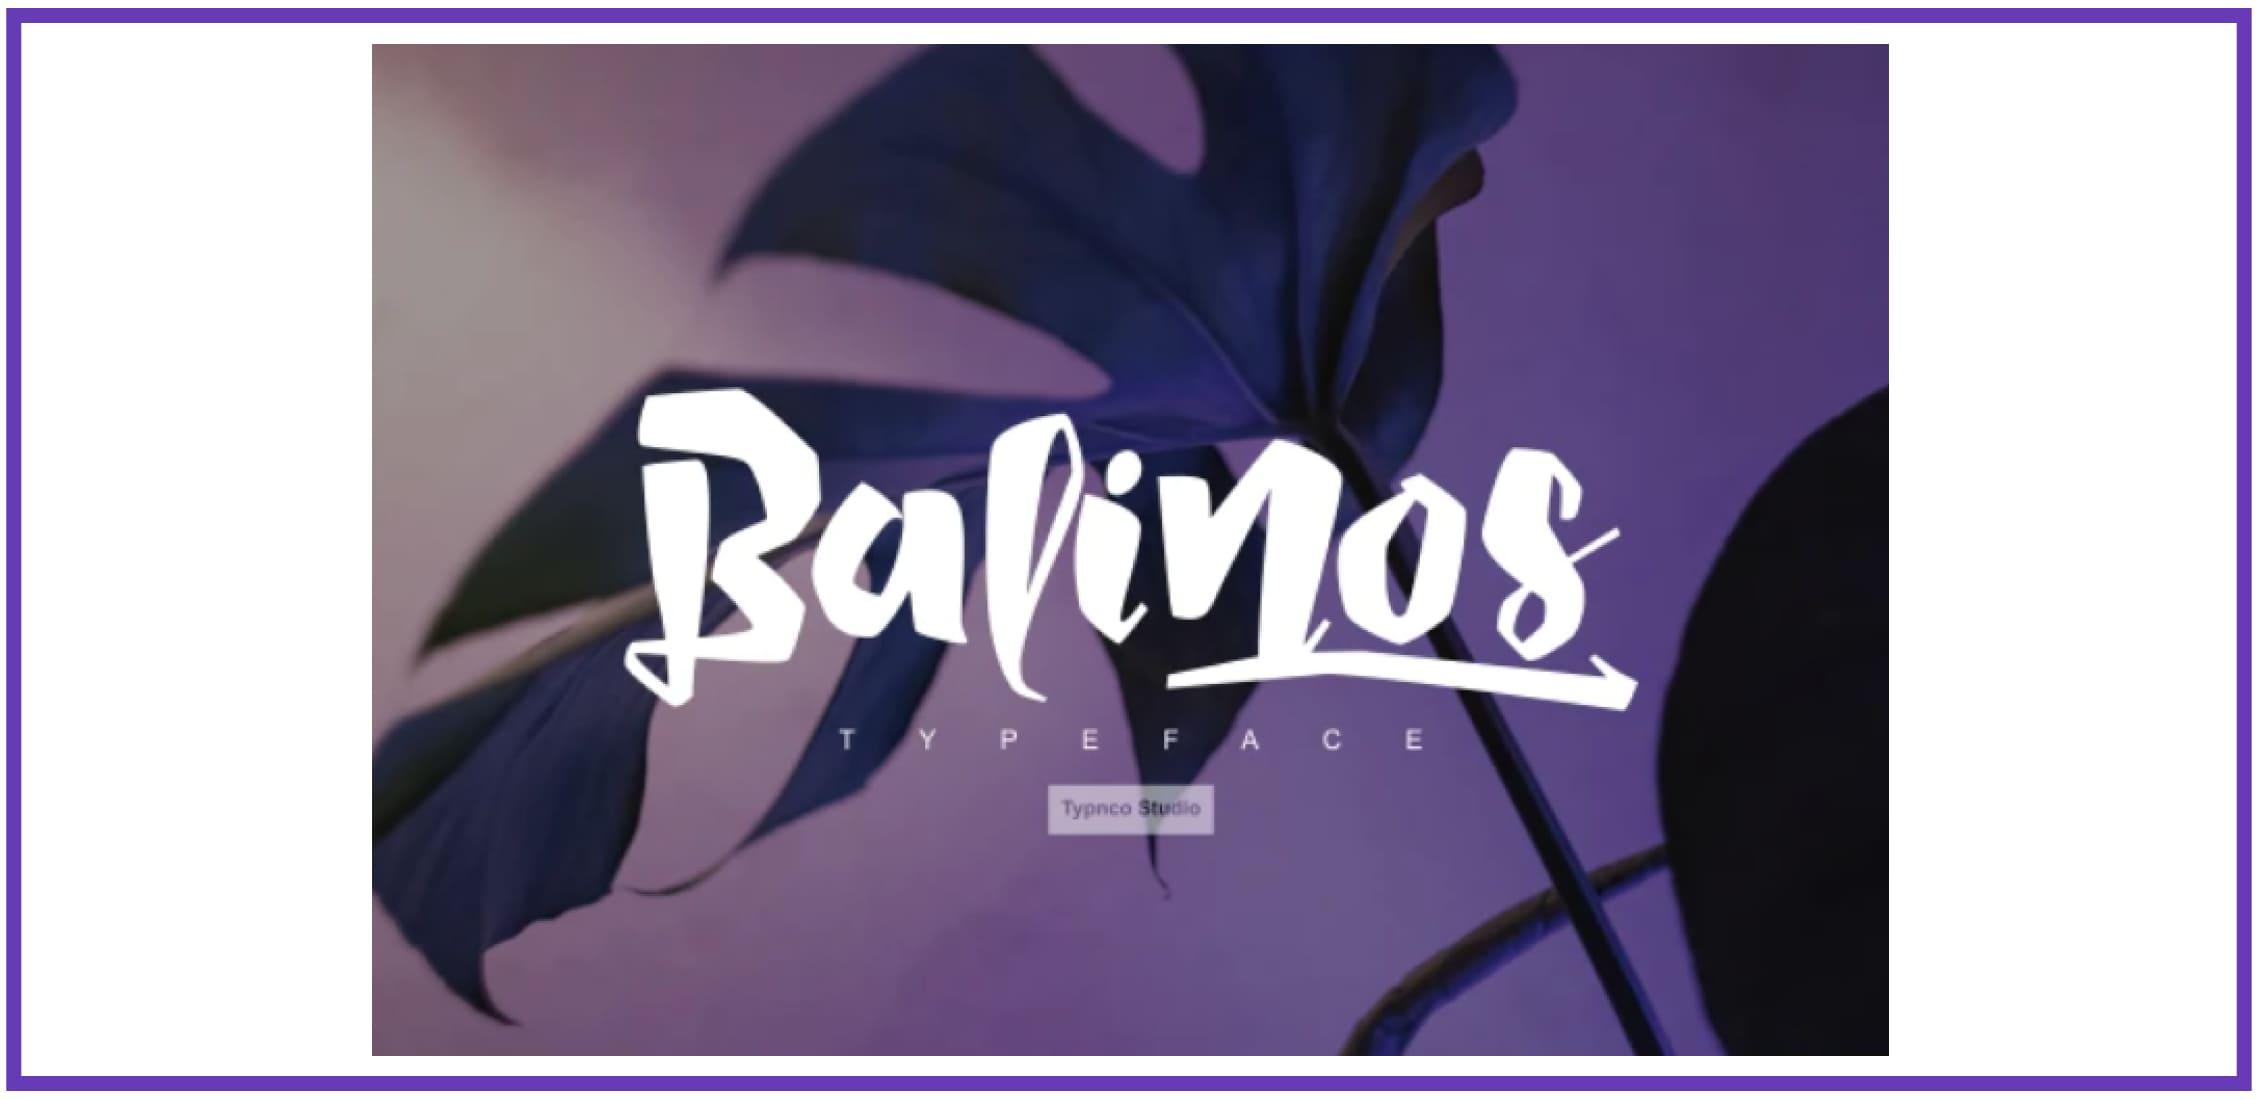 Balinos displat Font. Tropical Font.